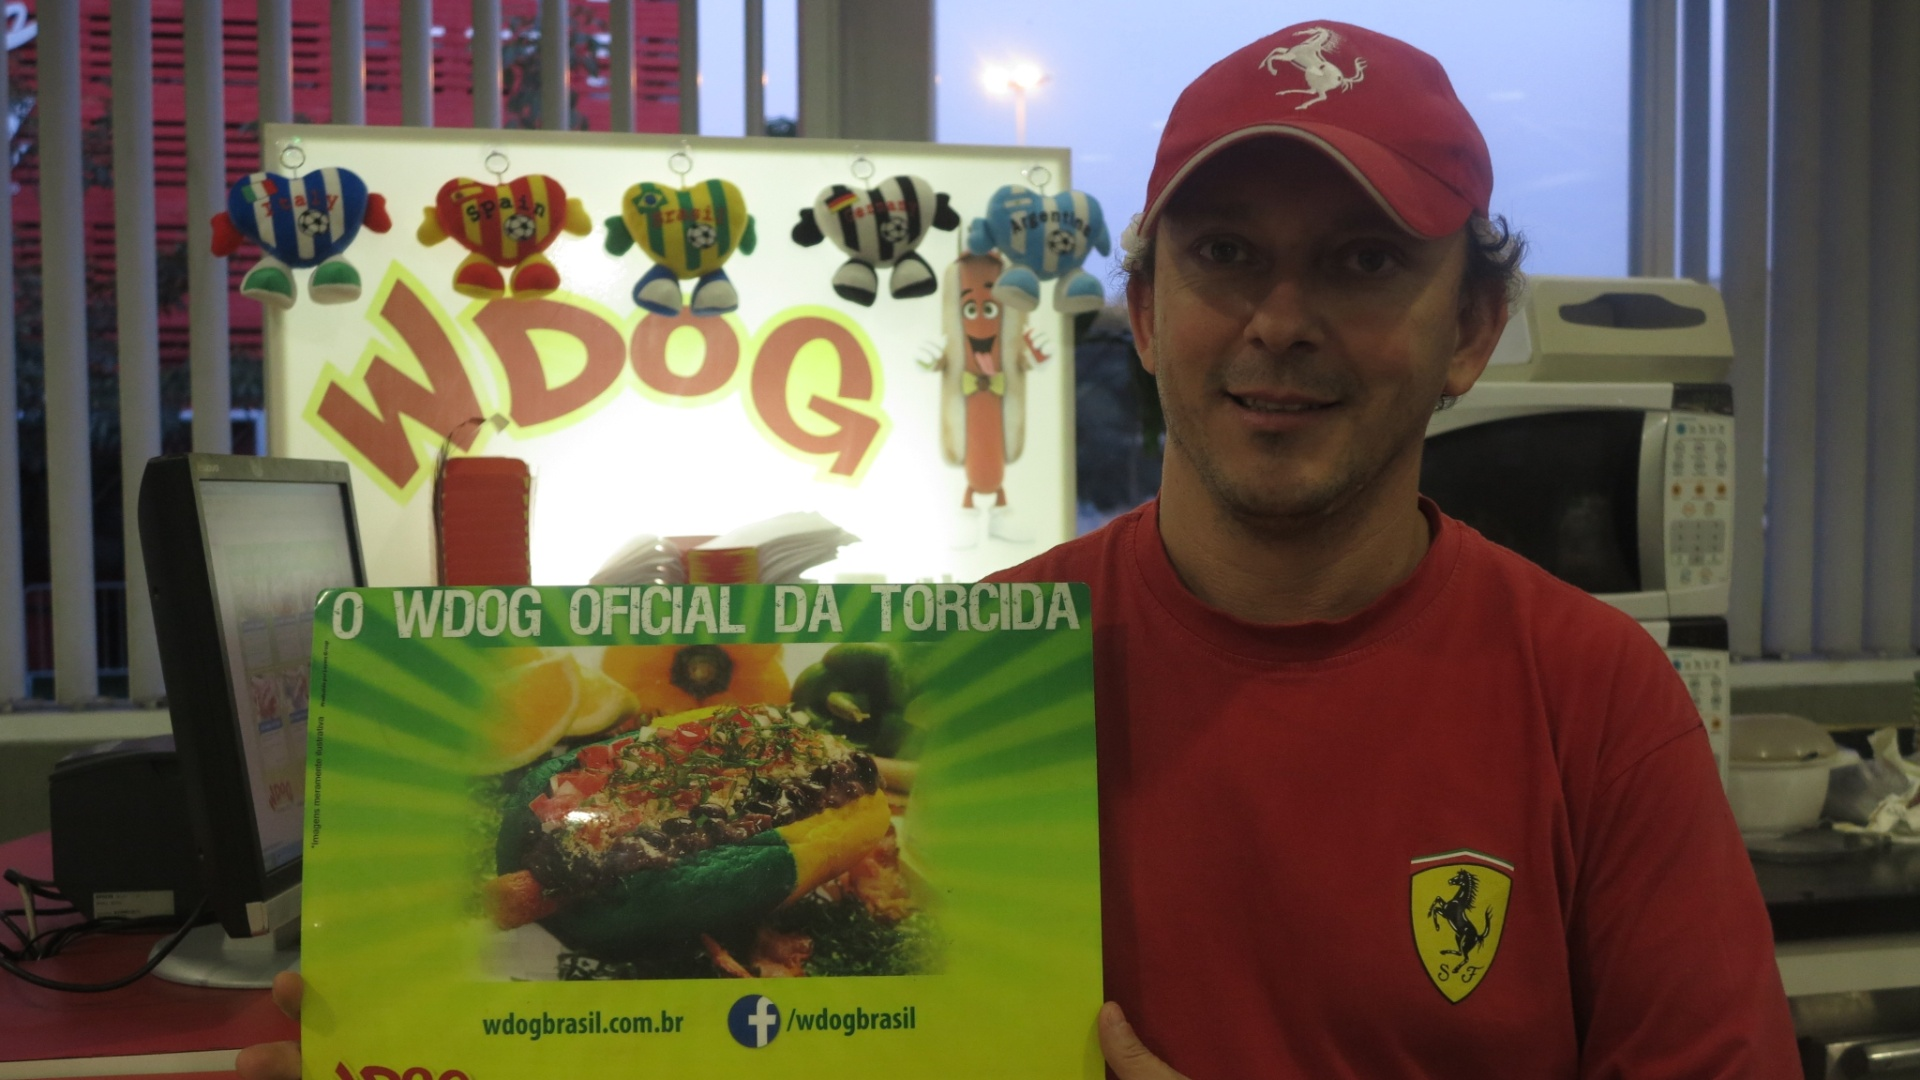 Quiosque WDog, no metrô Itaquera, aposta na onda dos hot-dogs temáticos e faz cardápio especial para as quartas de final da Copa do Mundo